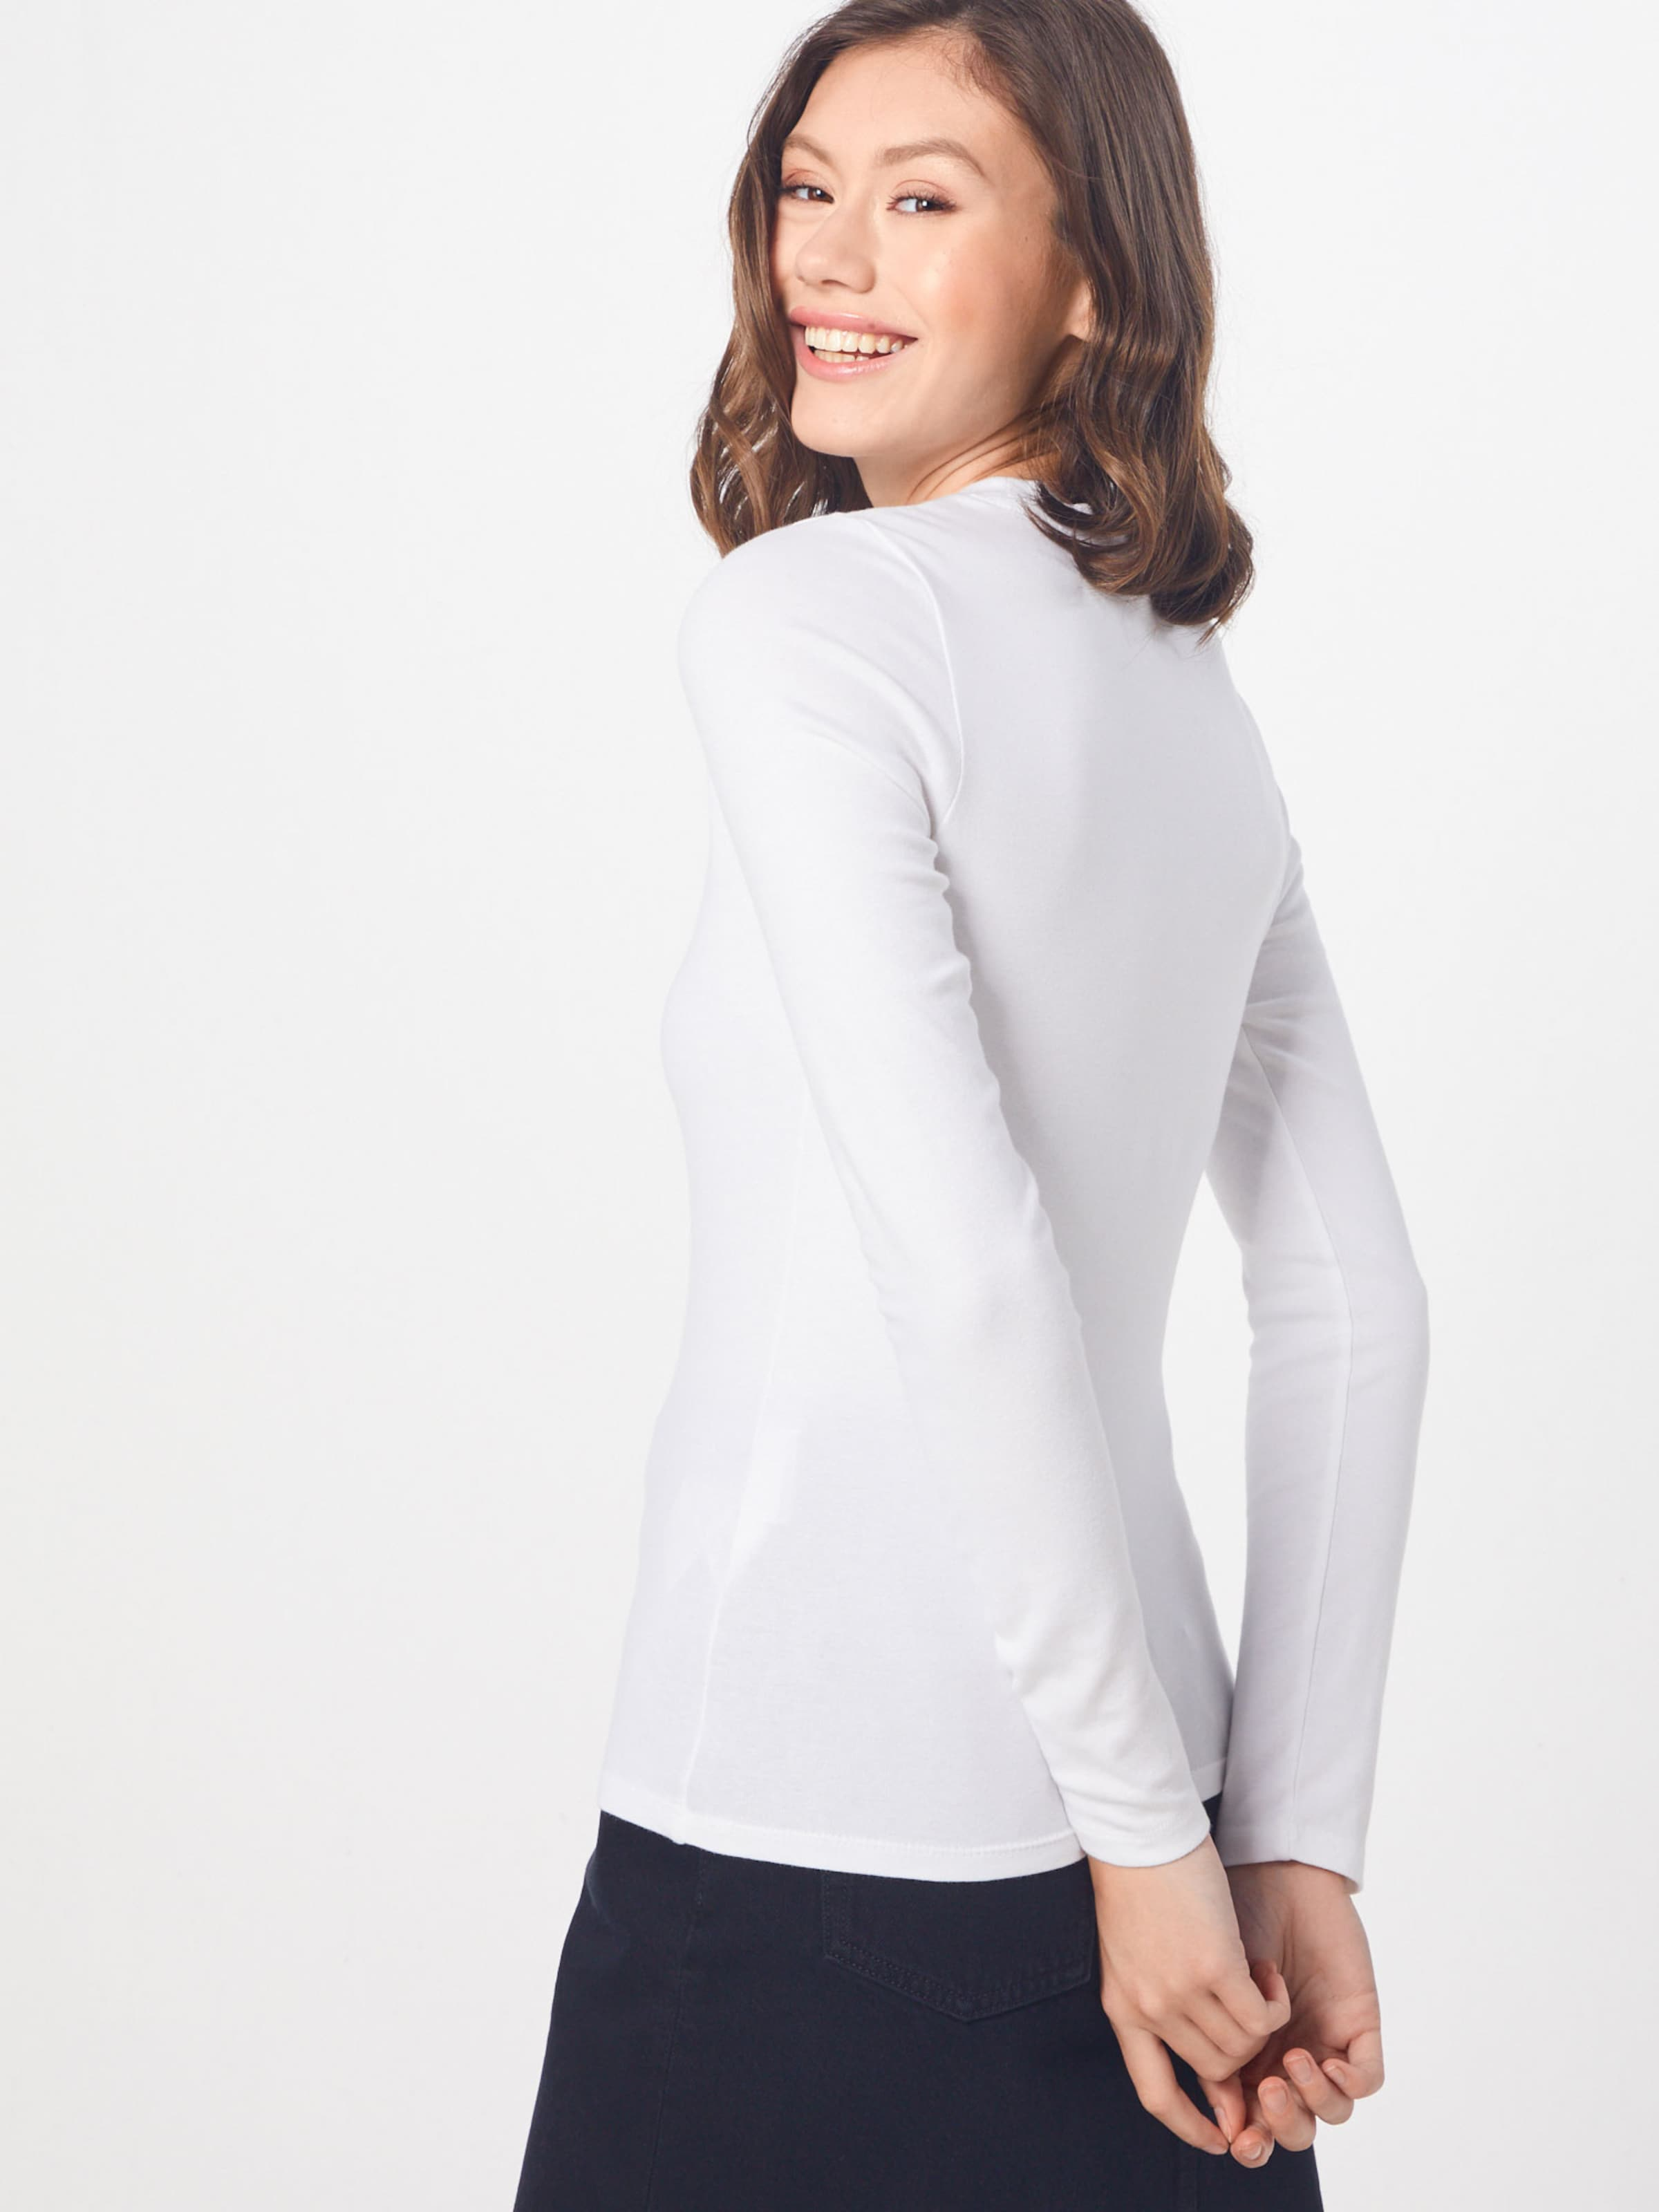 Tee' T shirt 'ls En Blanc Baby Levi's eWIEHDY92